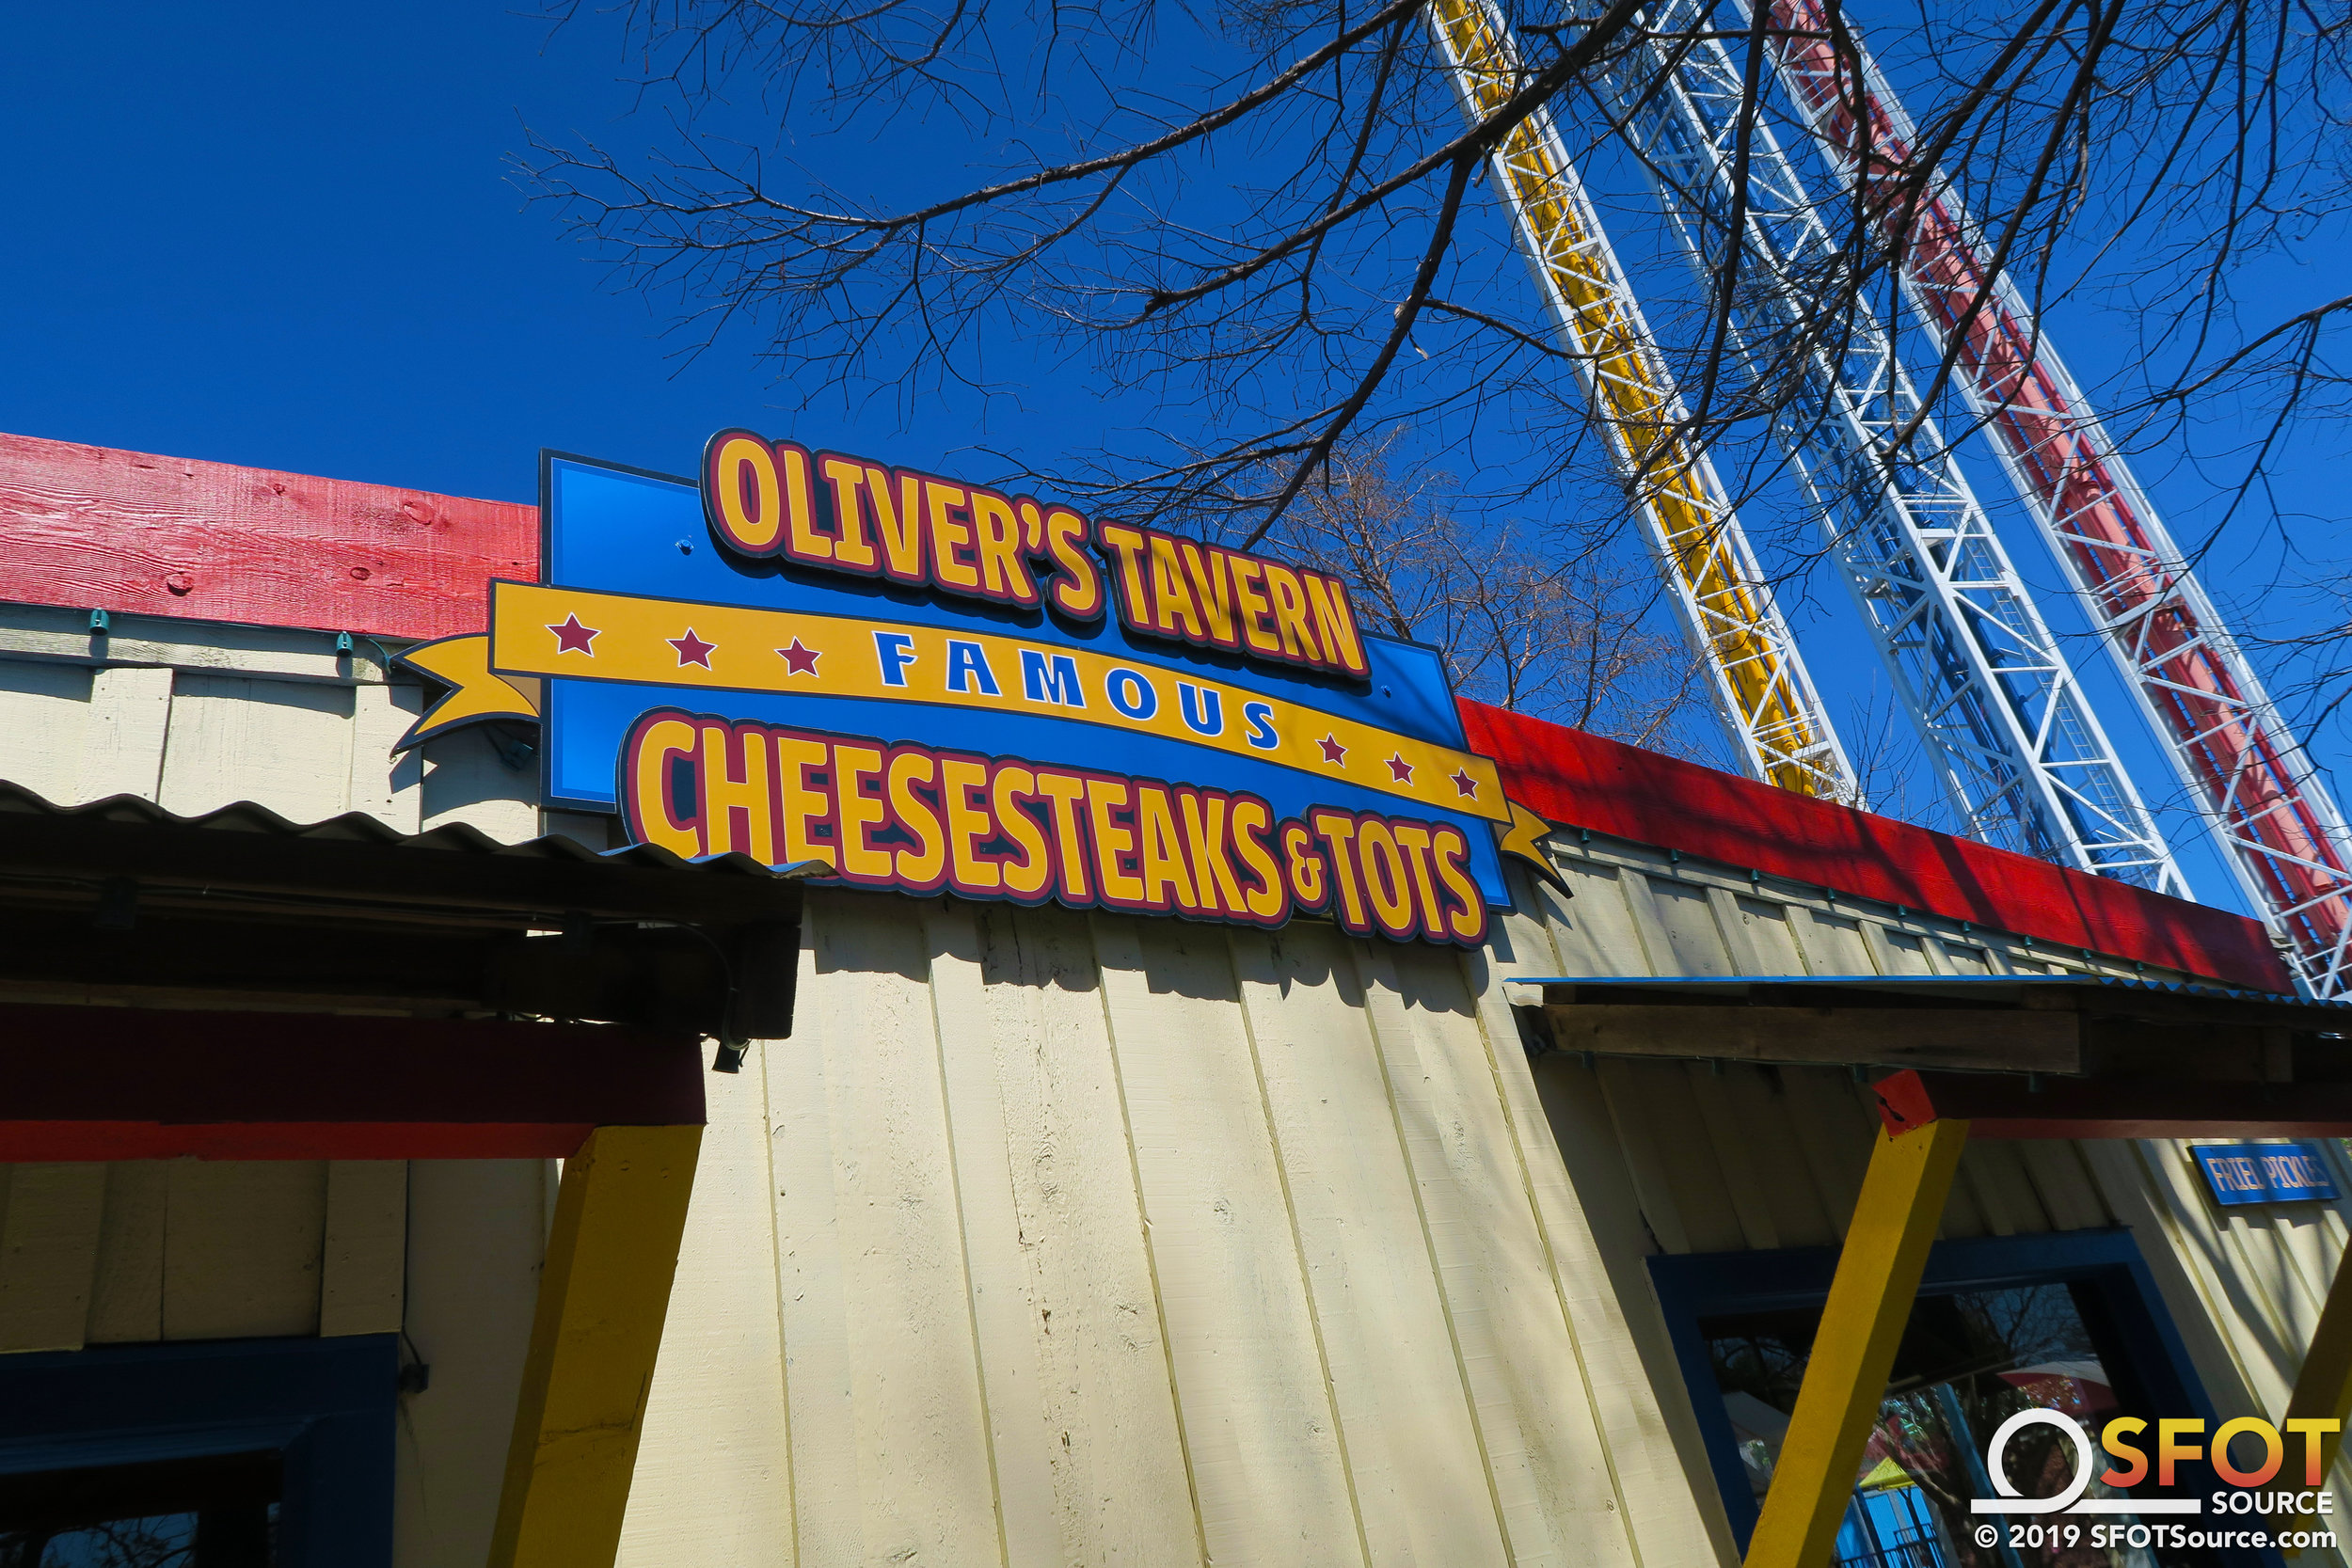 Oliver's Tavern